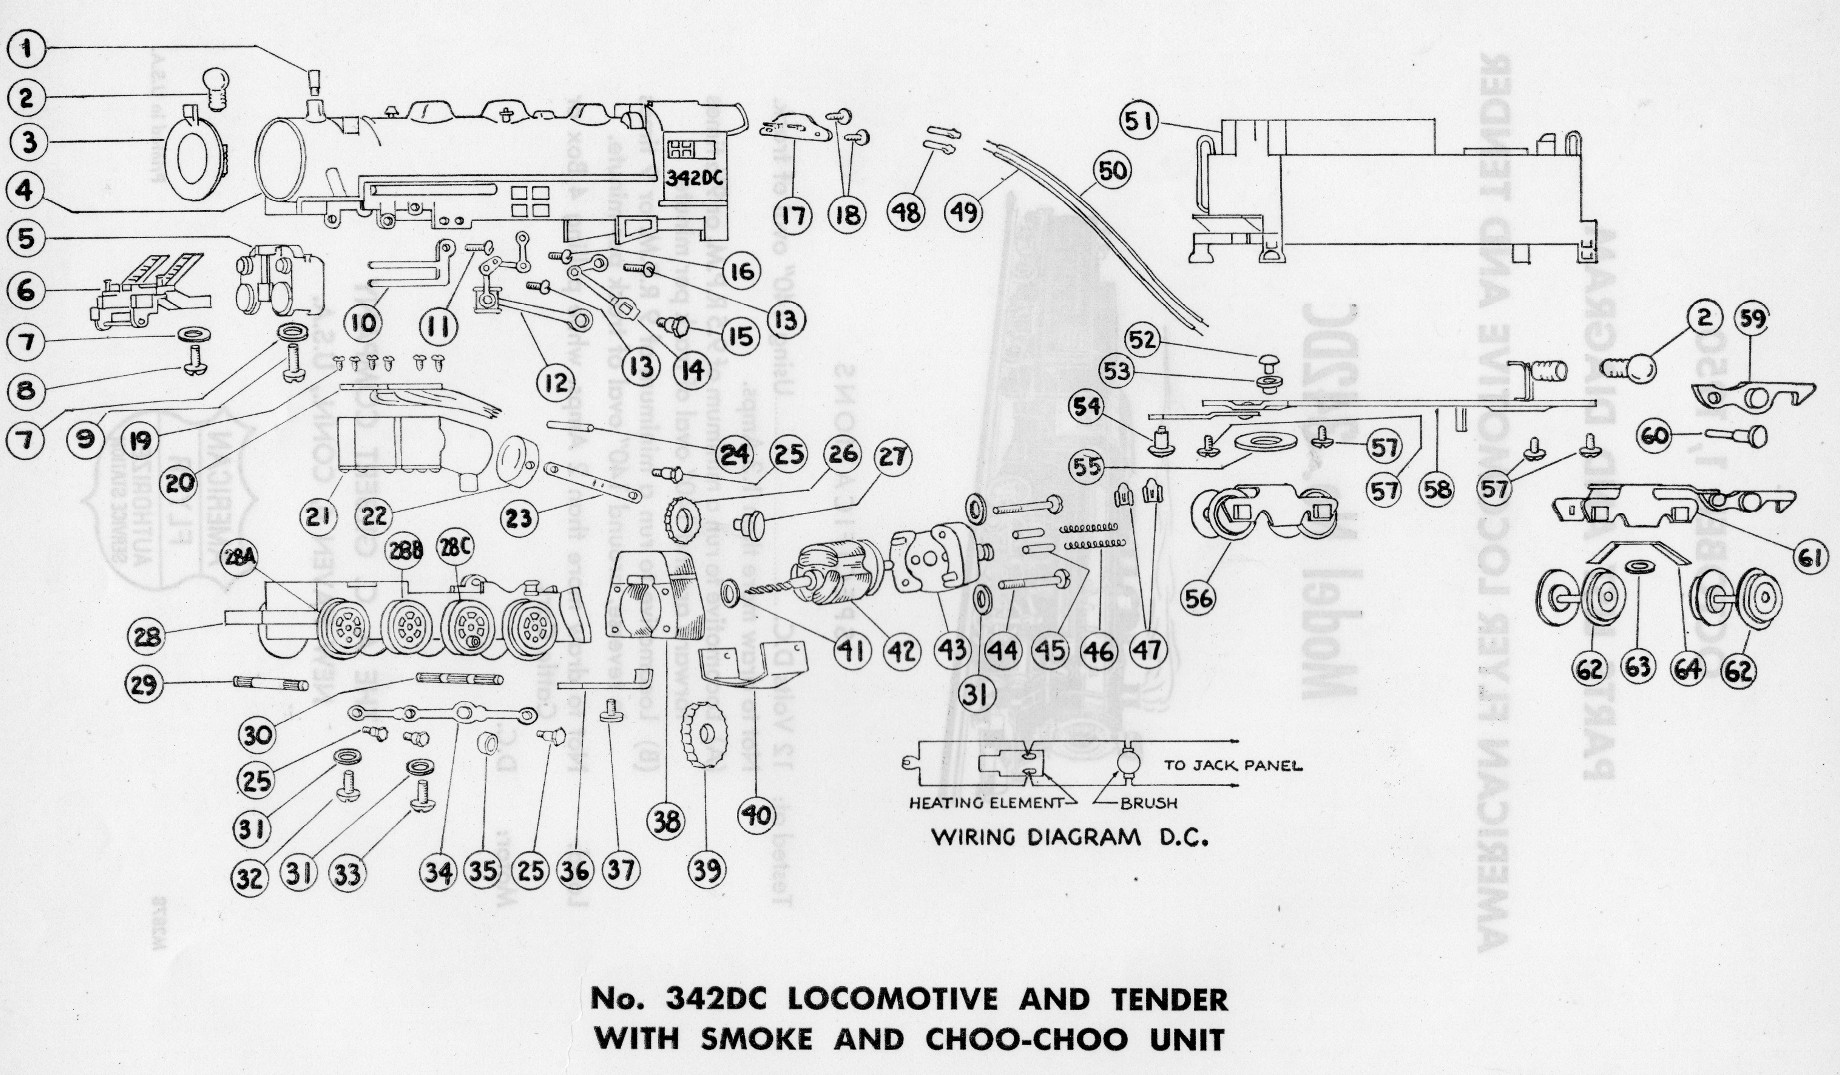 American Flyer Locomotive 342dc Parts List Amp Diagram